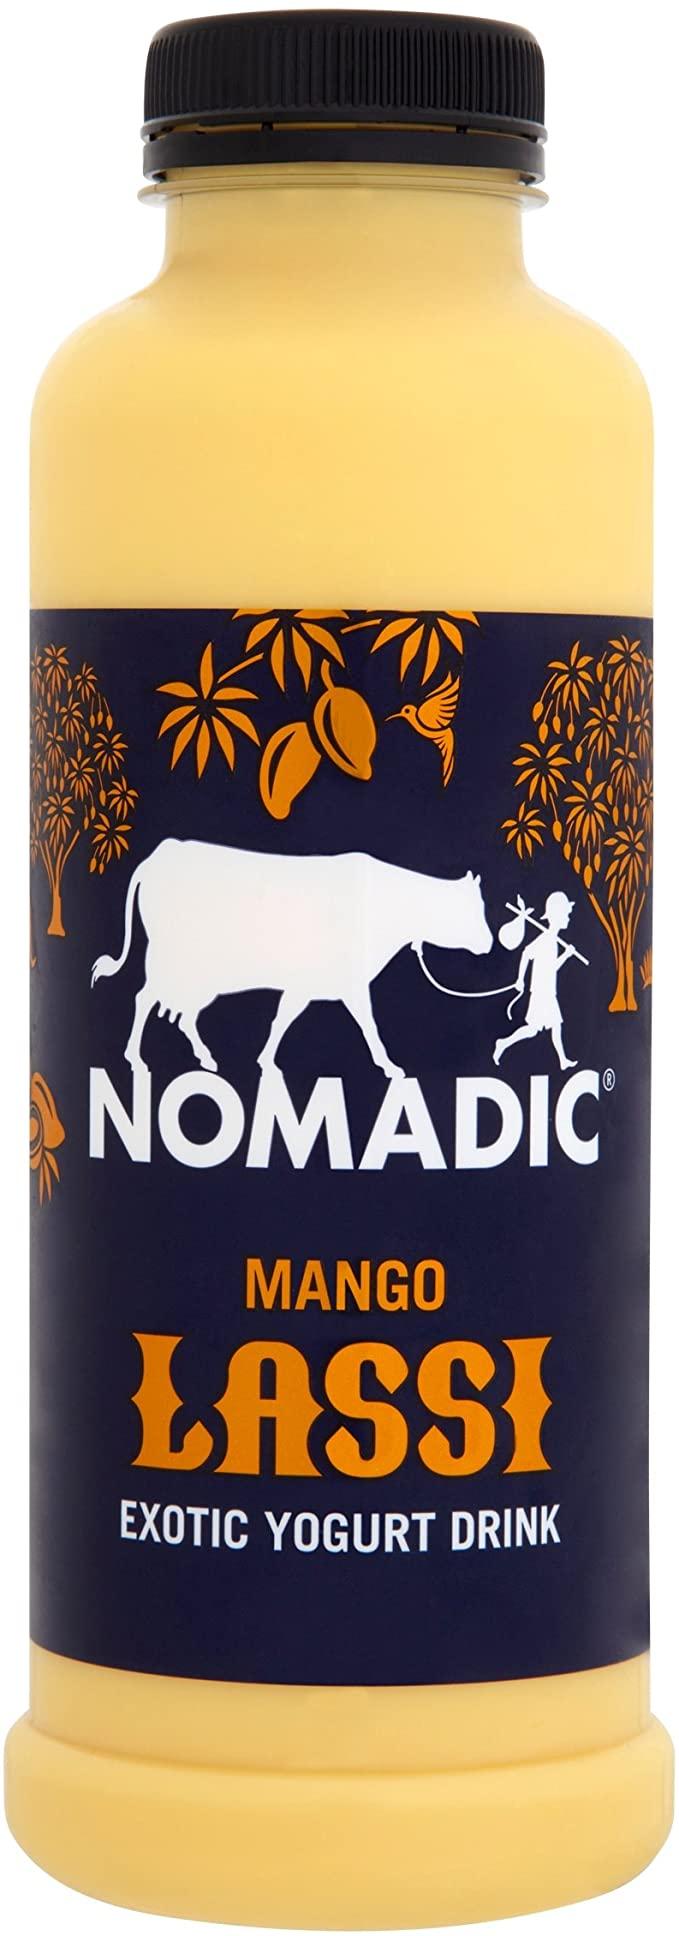 Nomadic Mango Lassi Yogurt Drink 500ml £1 (+ Delivery Charge / Minimum Spend Applies) at Asda